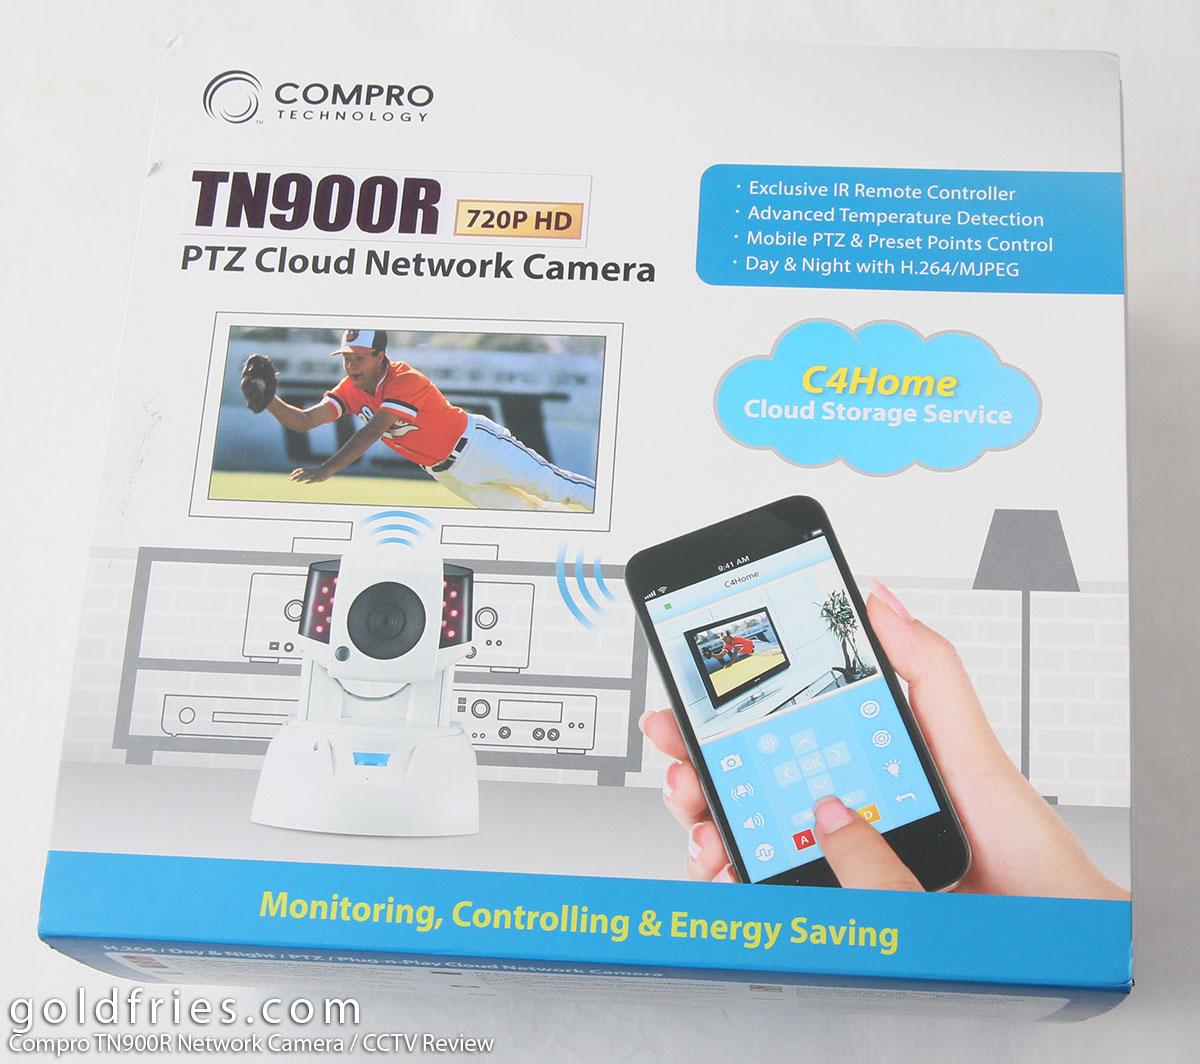 Compro TN900R Network Camera / CCTV Review